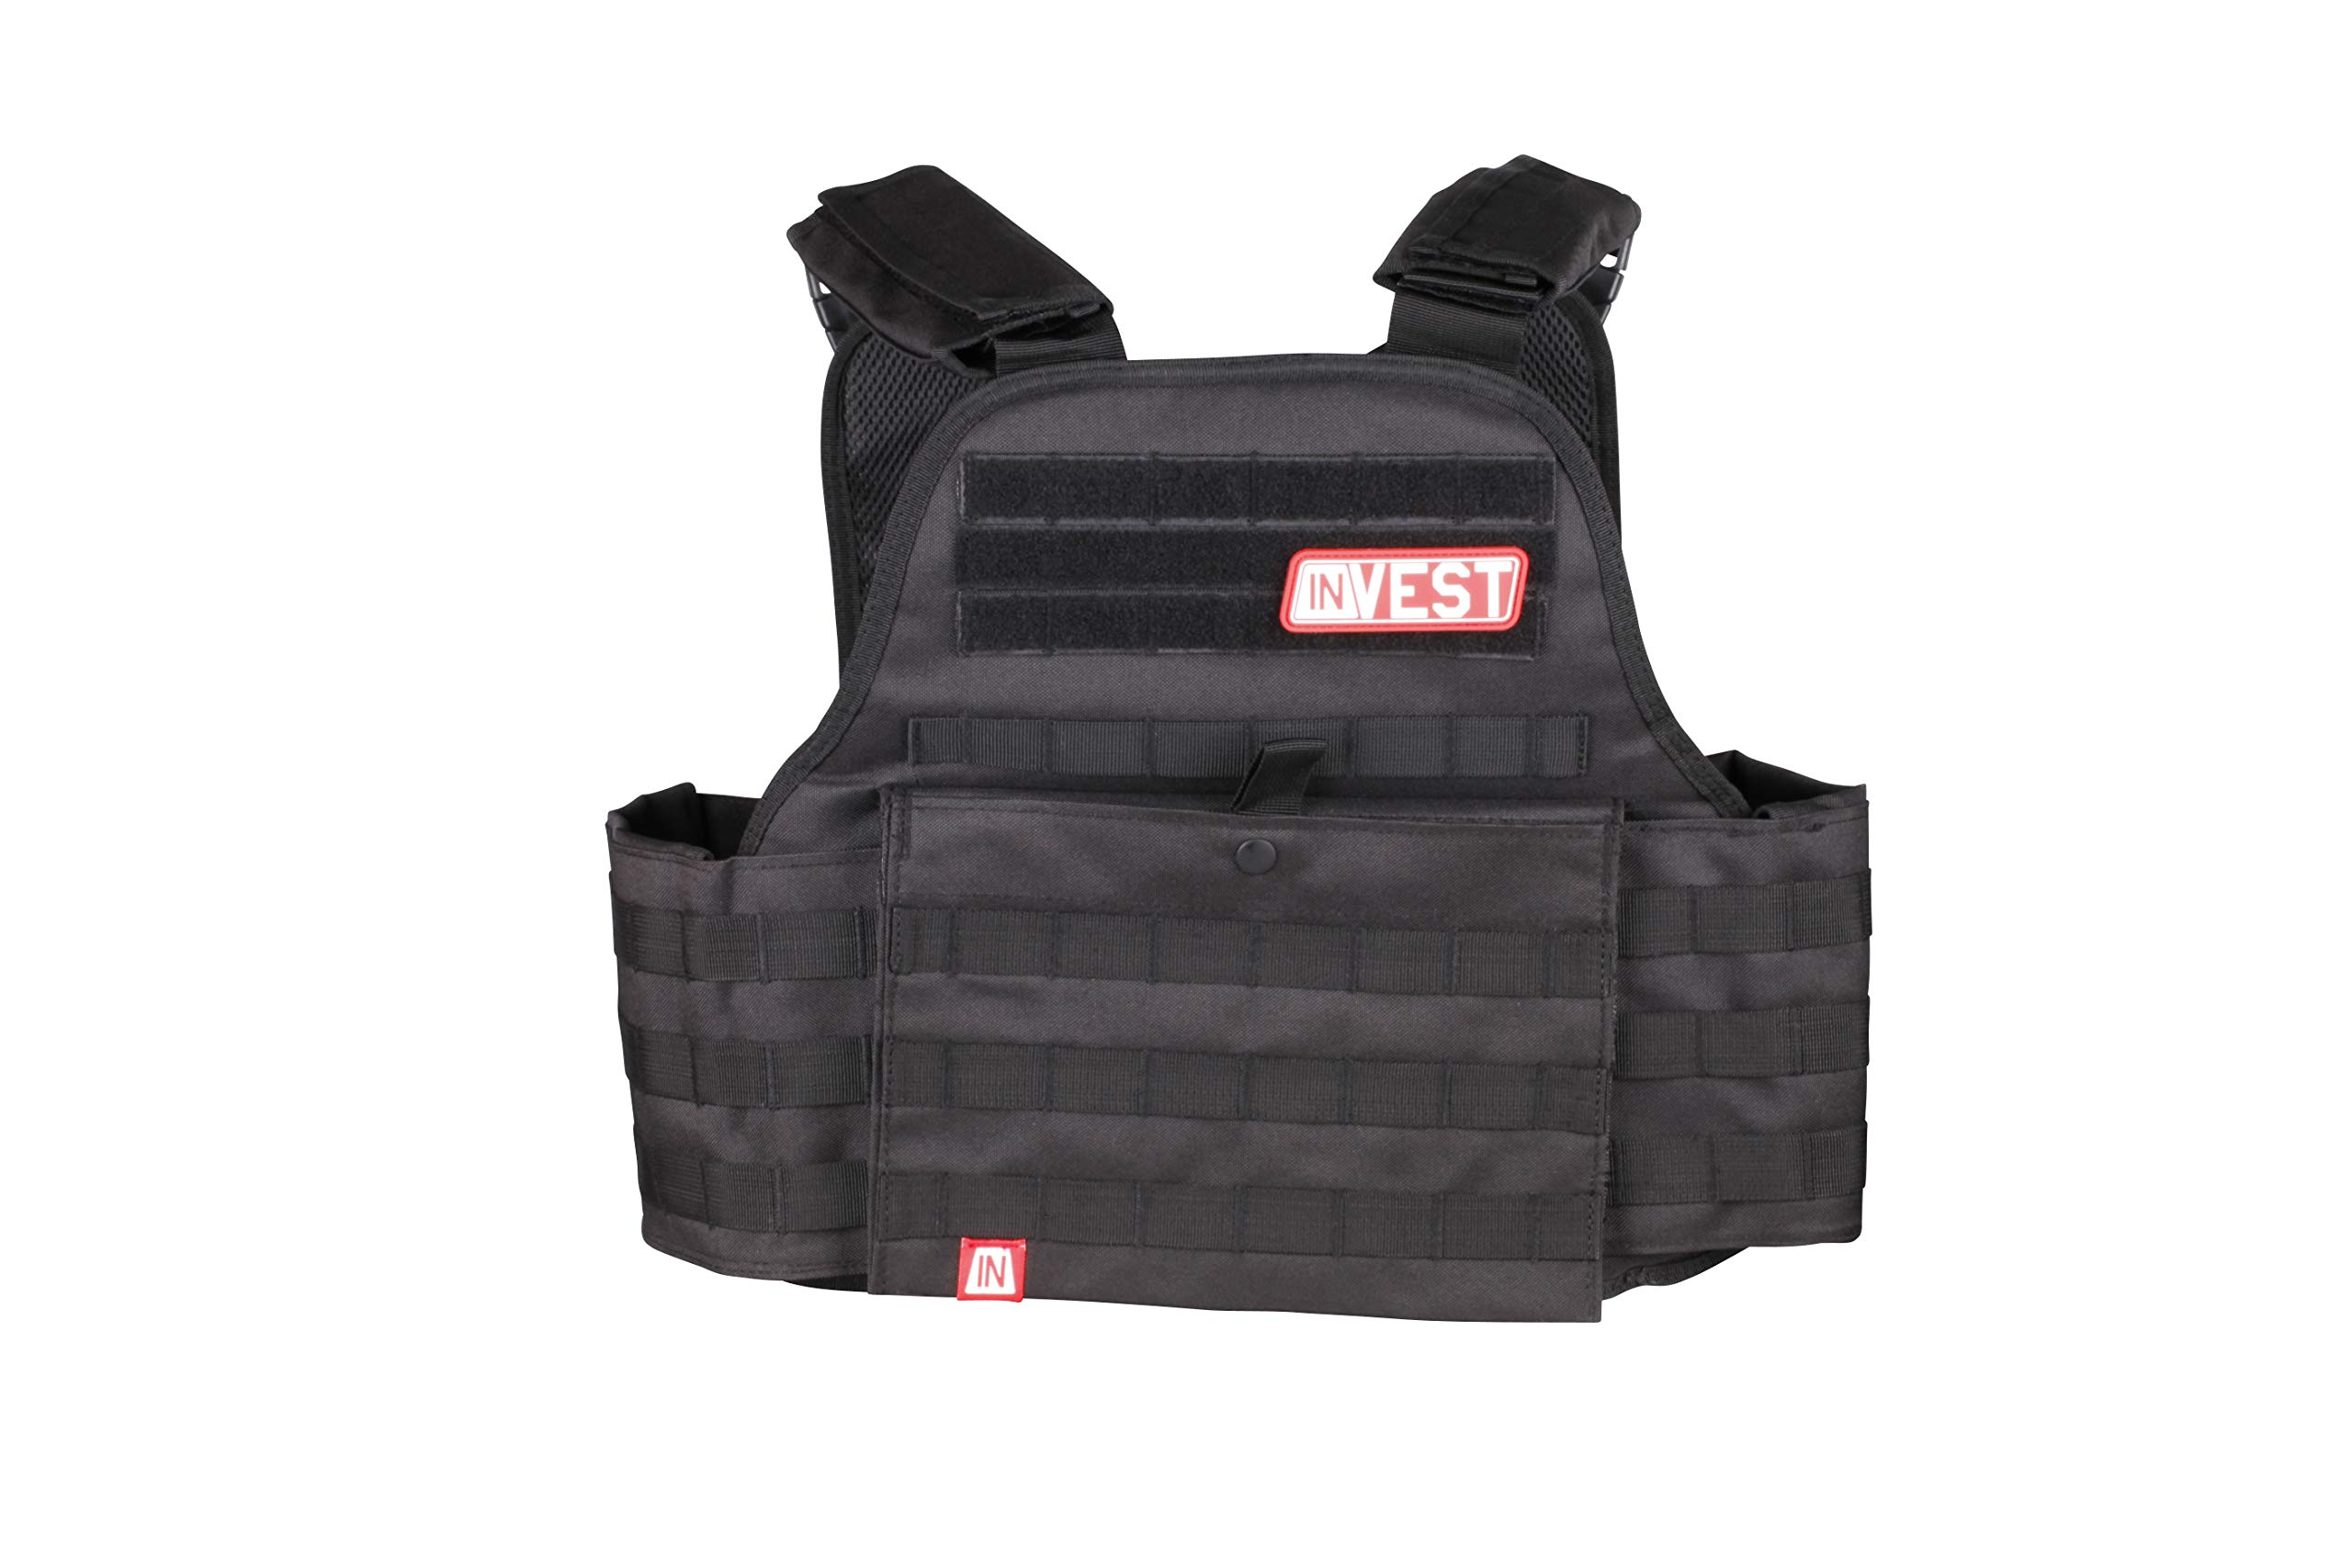 Invest Pro Weight Vest, 14 lbs. (Midnight Black)